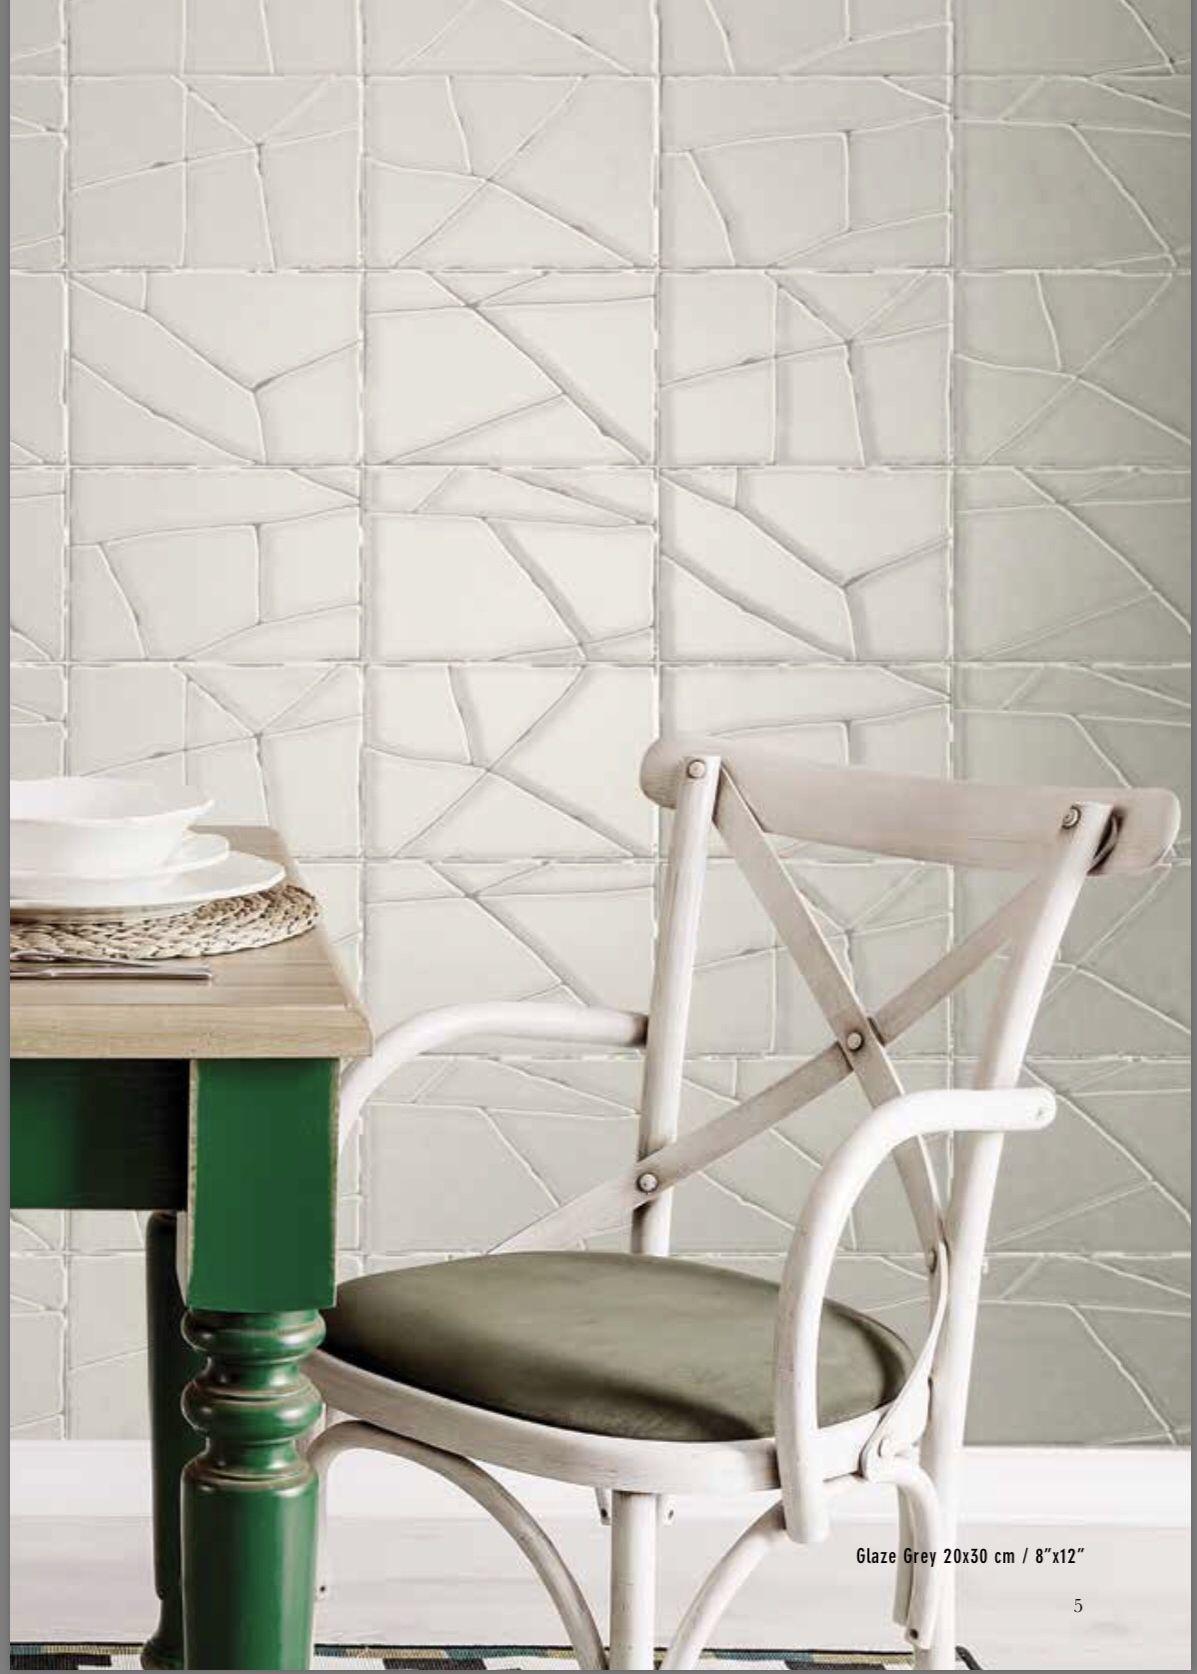 Burlington Gris Marengo Kitchen Tiles Price Natural Stone Tile Grey Bathroom Tiles